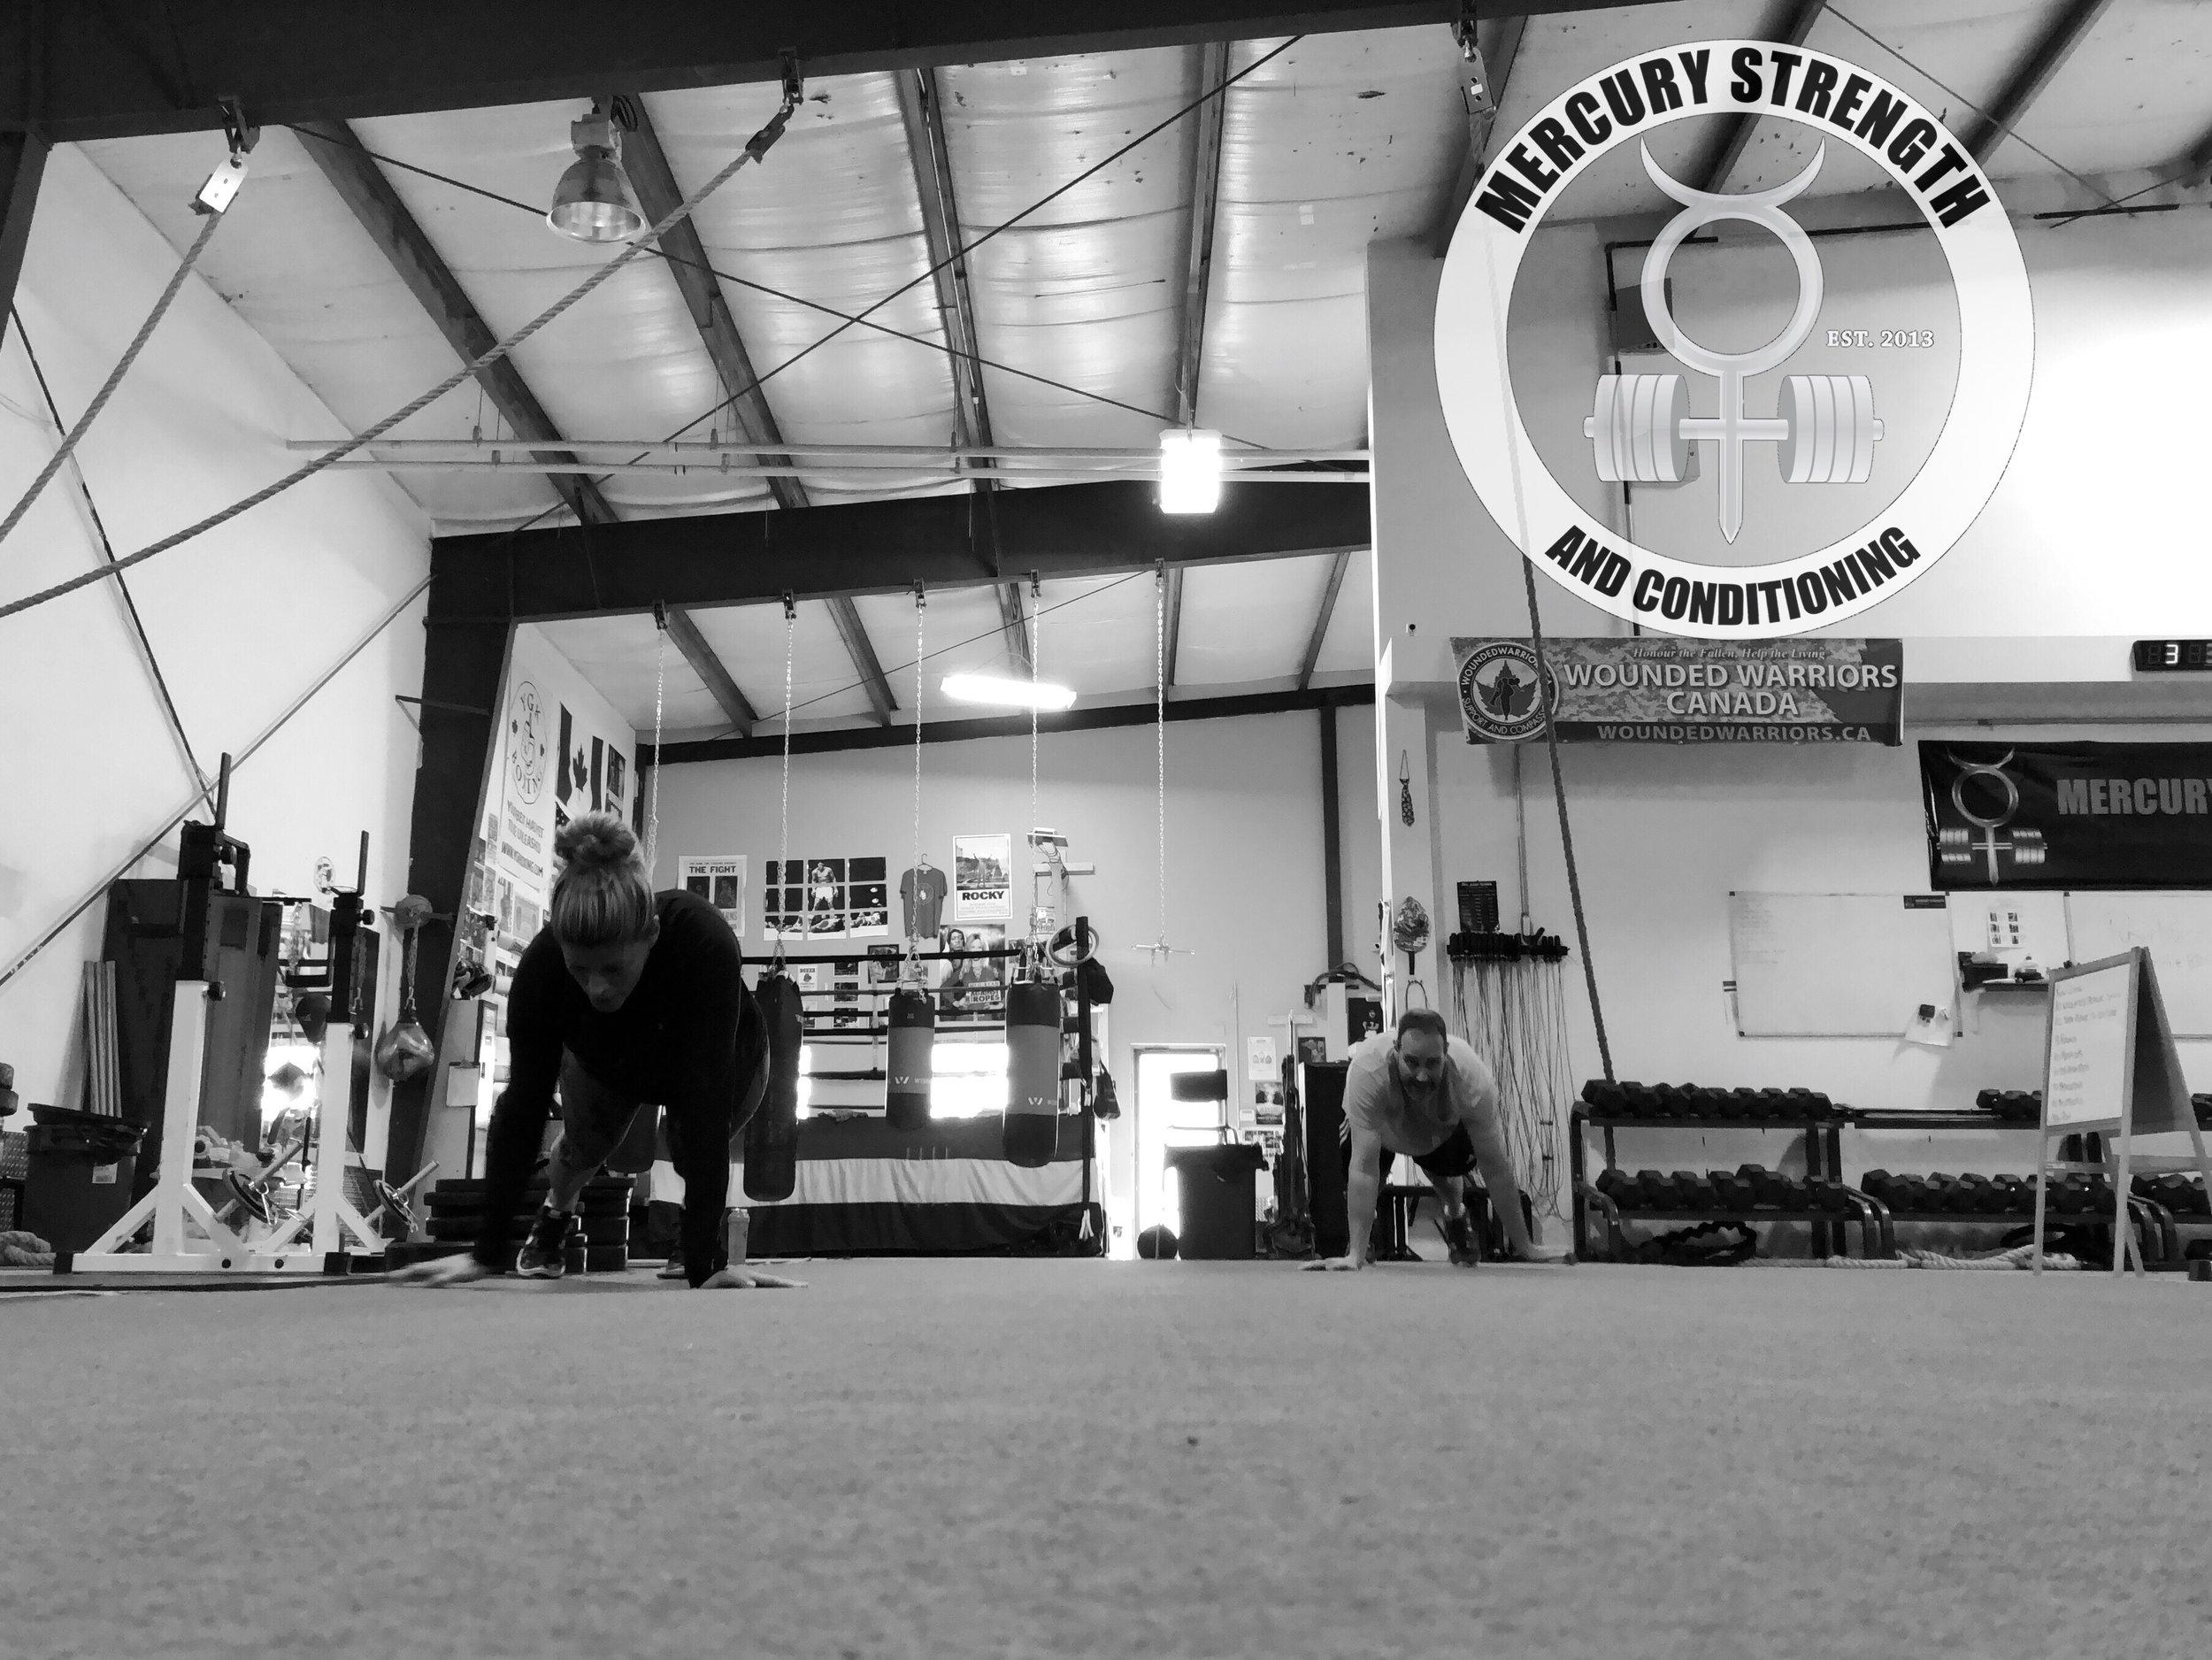 Gym-powerlifting-fitness-personal training-training-bootcamp-crossfit-kingston-kingston gym-kids-mercury-strength-conditioning-athlete-plank walk